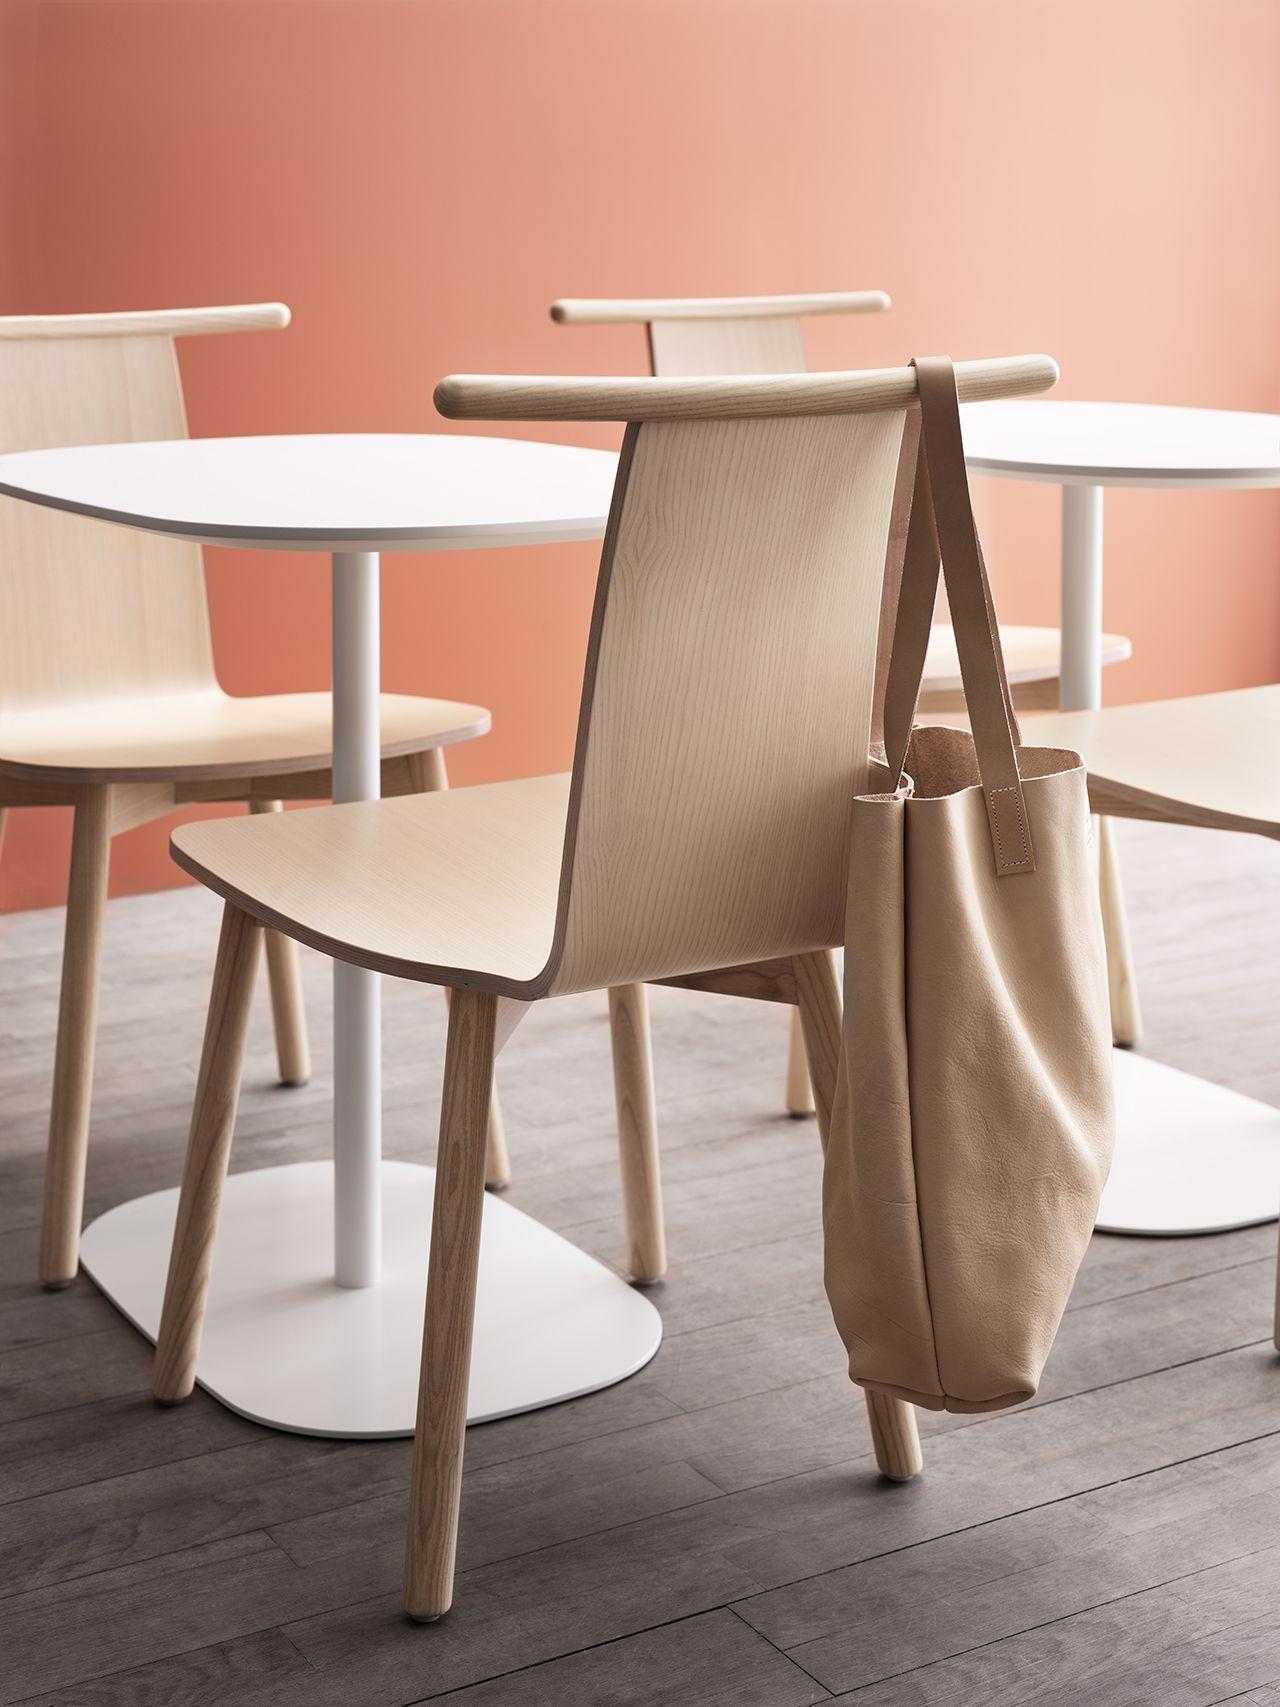 The Twig Chair From Skandiform Embodies Scandinavian Sense In 2020 Minimalist Chair Chair Design Wooden Furniture